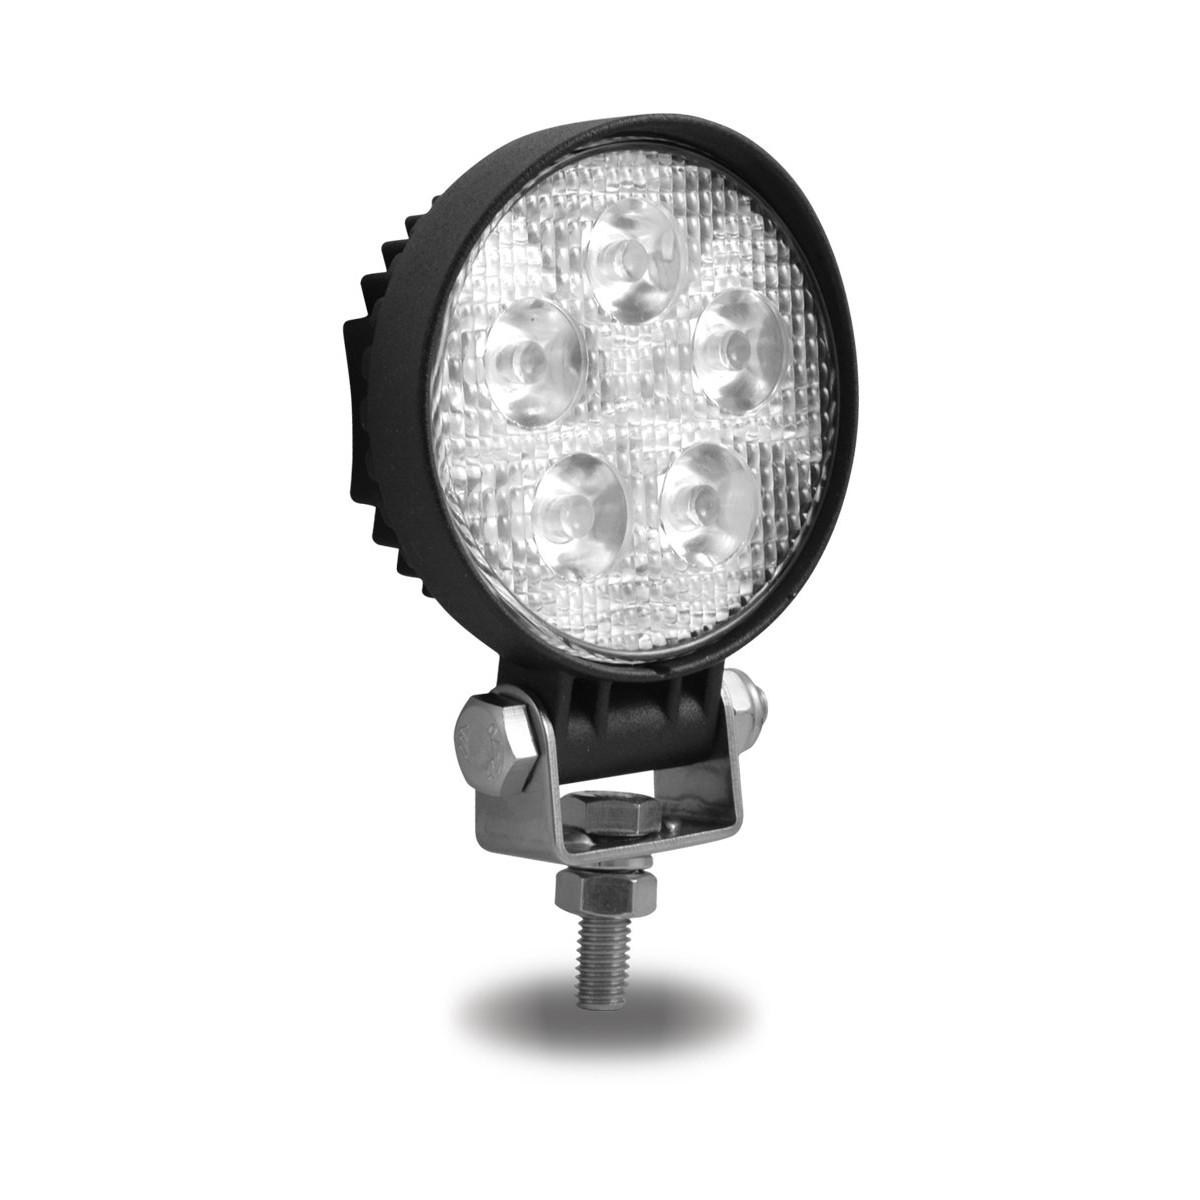 3 mini round spot work lamp 900 lumens round work lamps work lamps. Black Bedroom Furniture Sets. Home Design Ideas